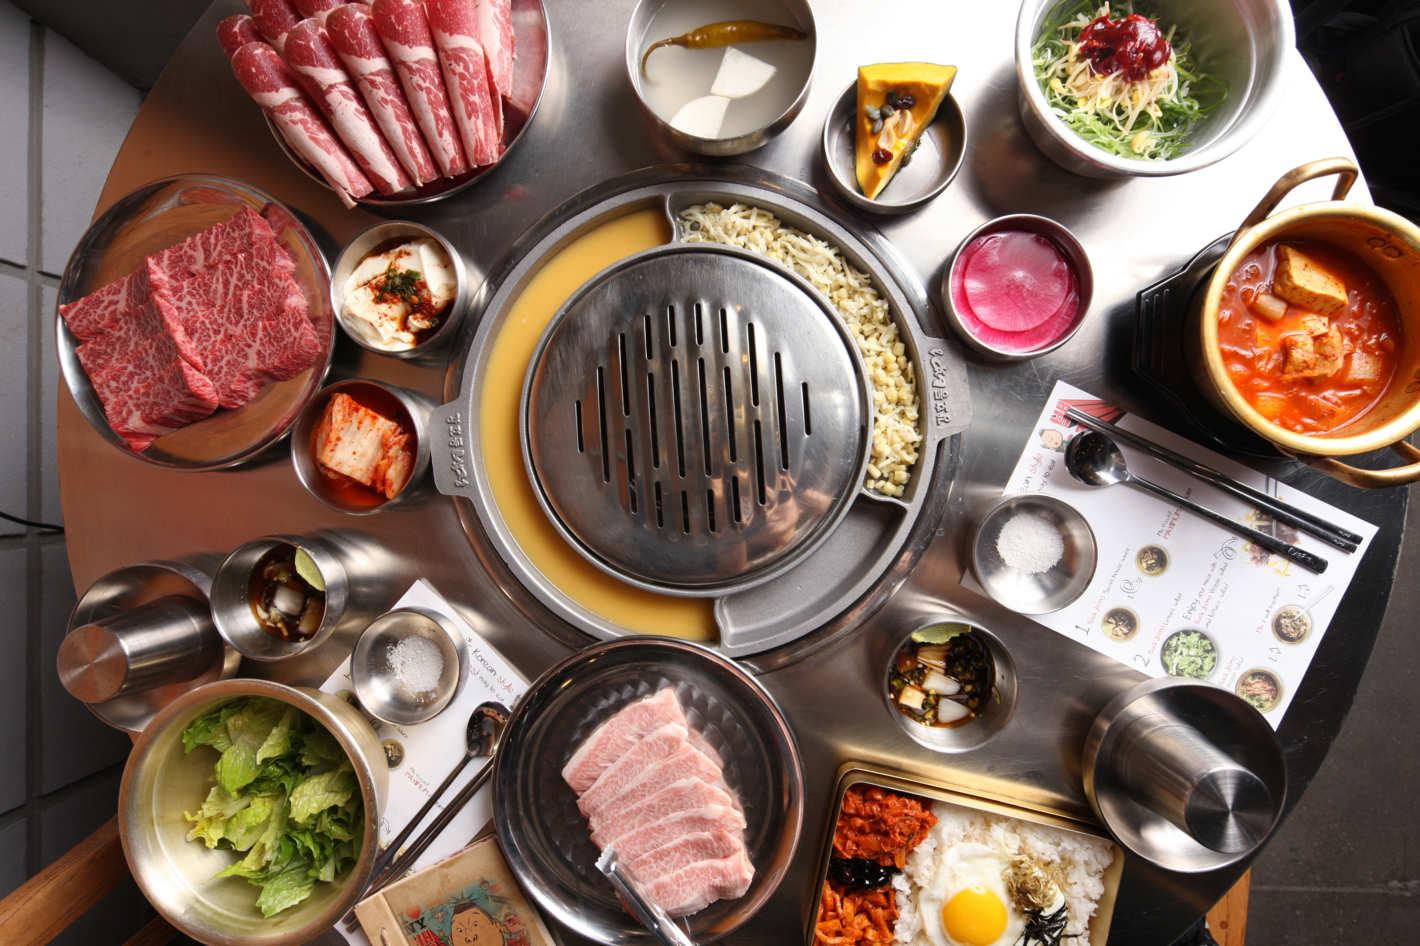 23-kang-ho-dong-baekjeong-011.w710.h473.2x.jpg